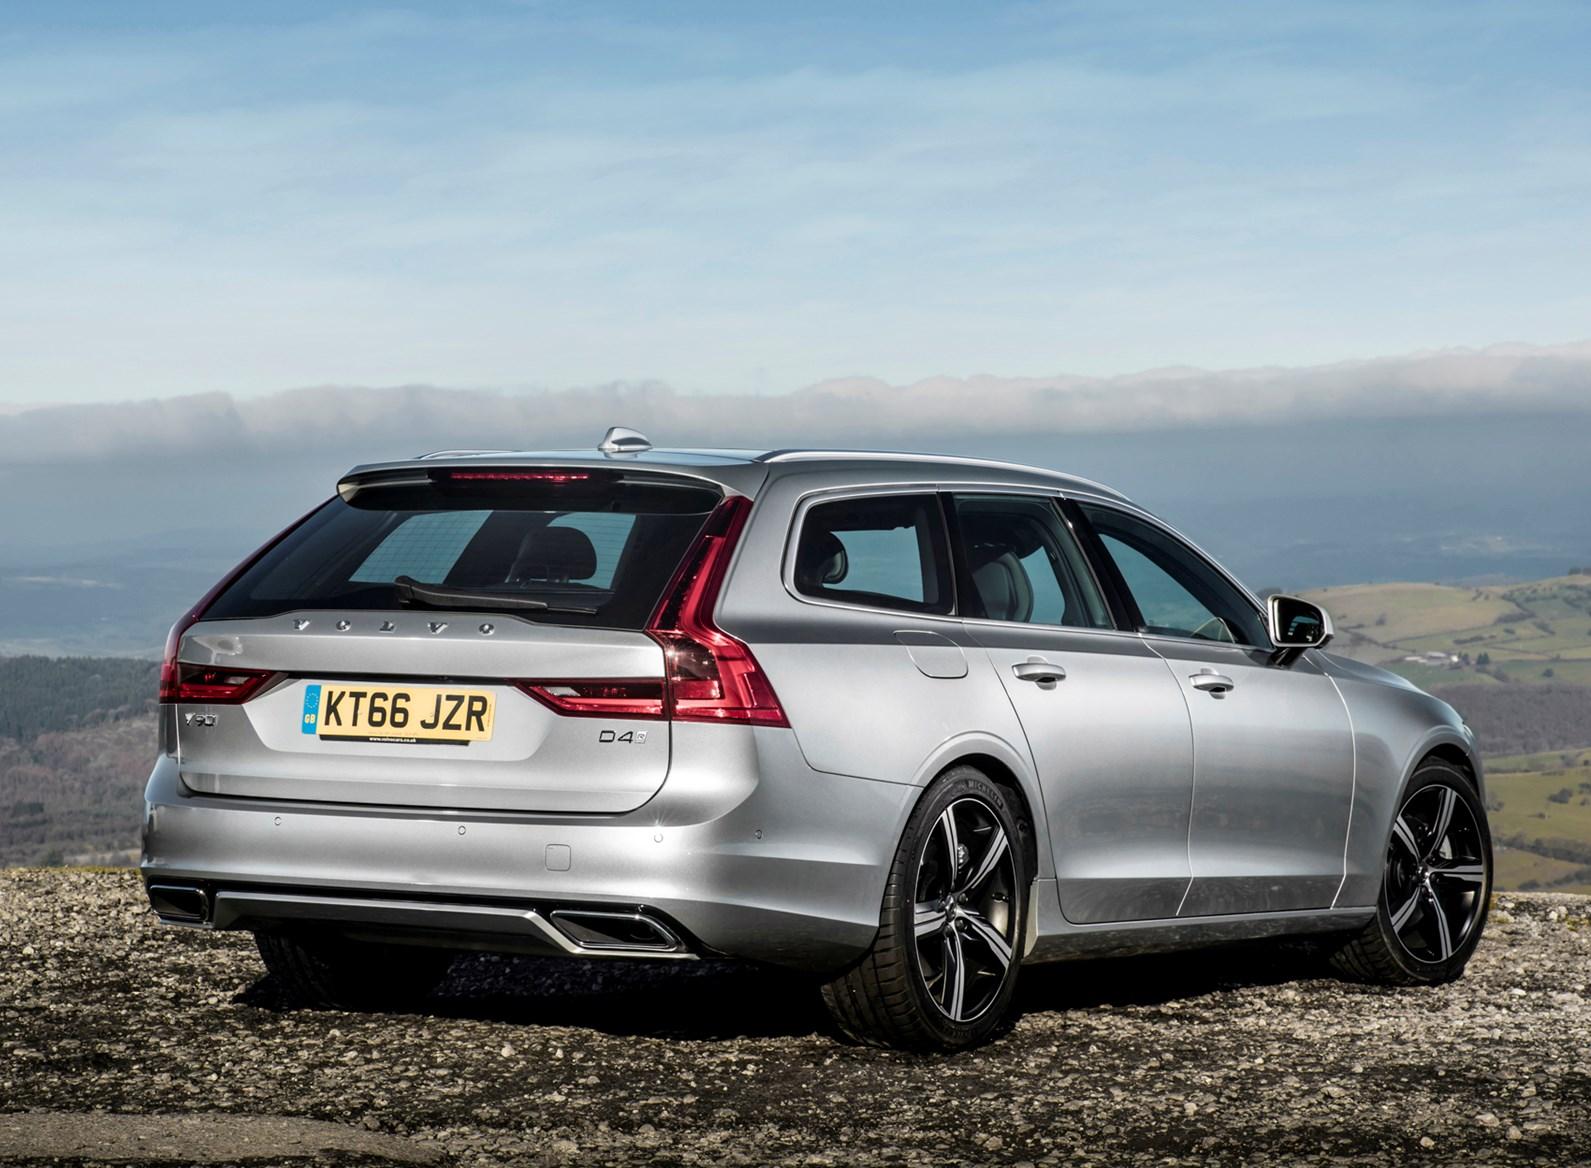 Volvo V90 - best estate cars for golfers